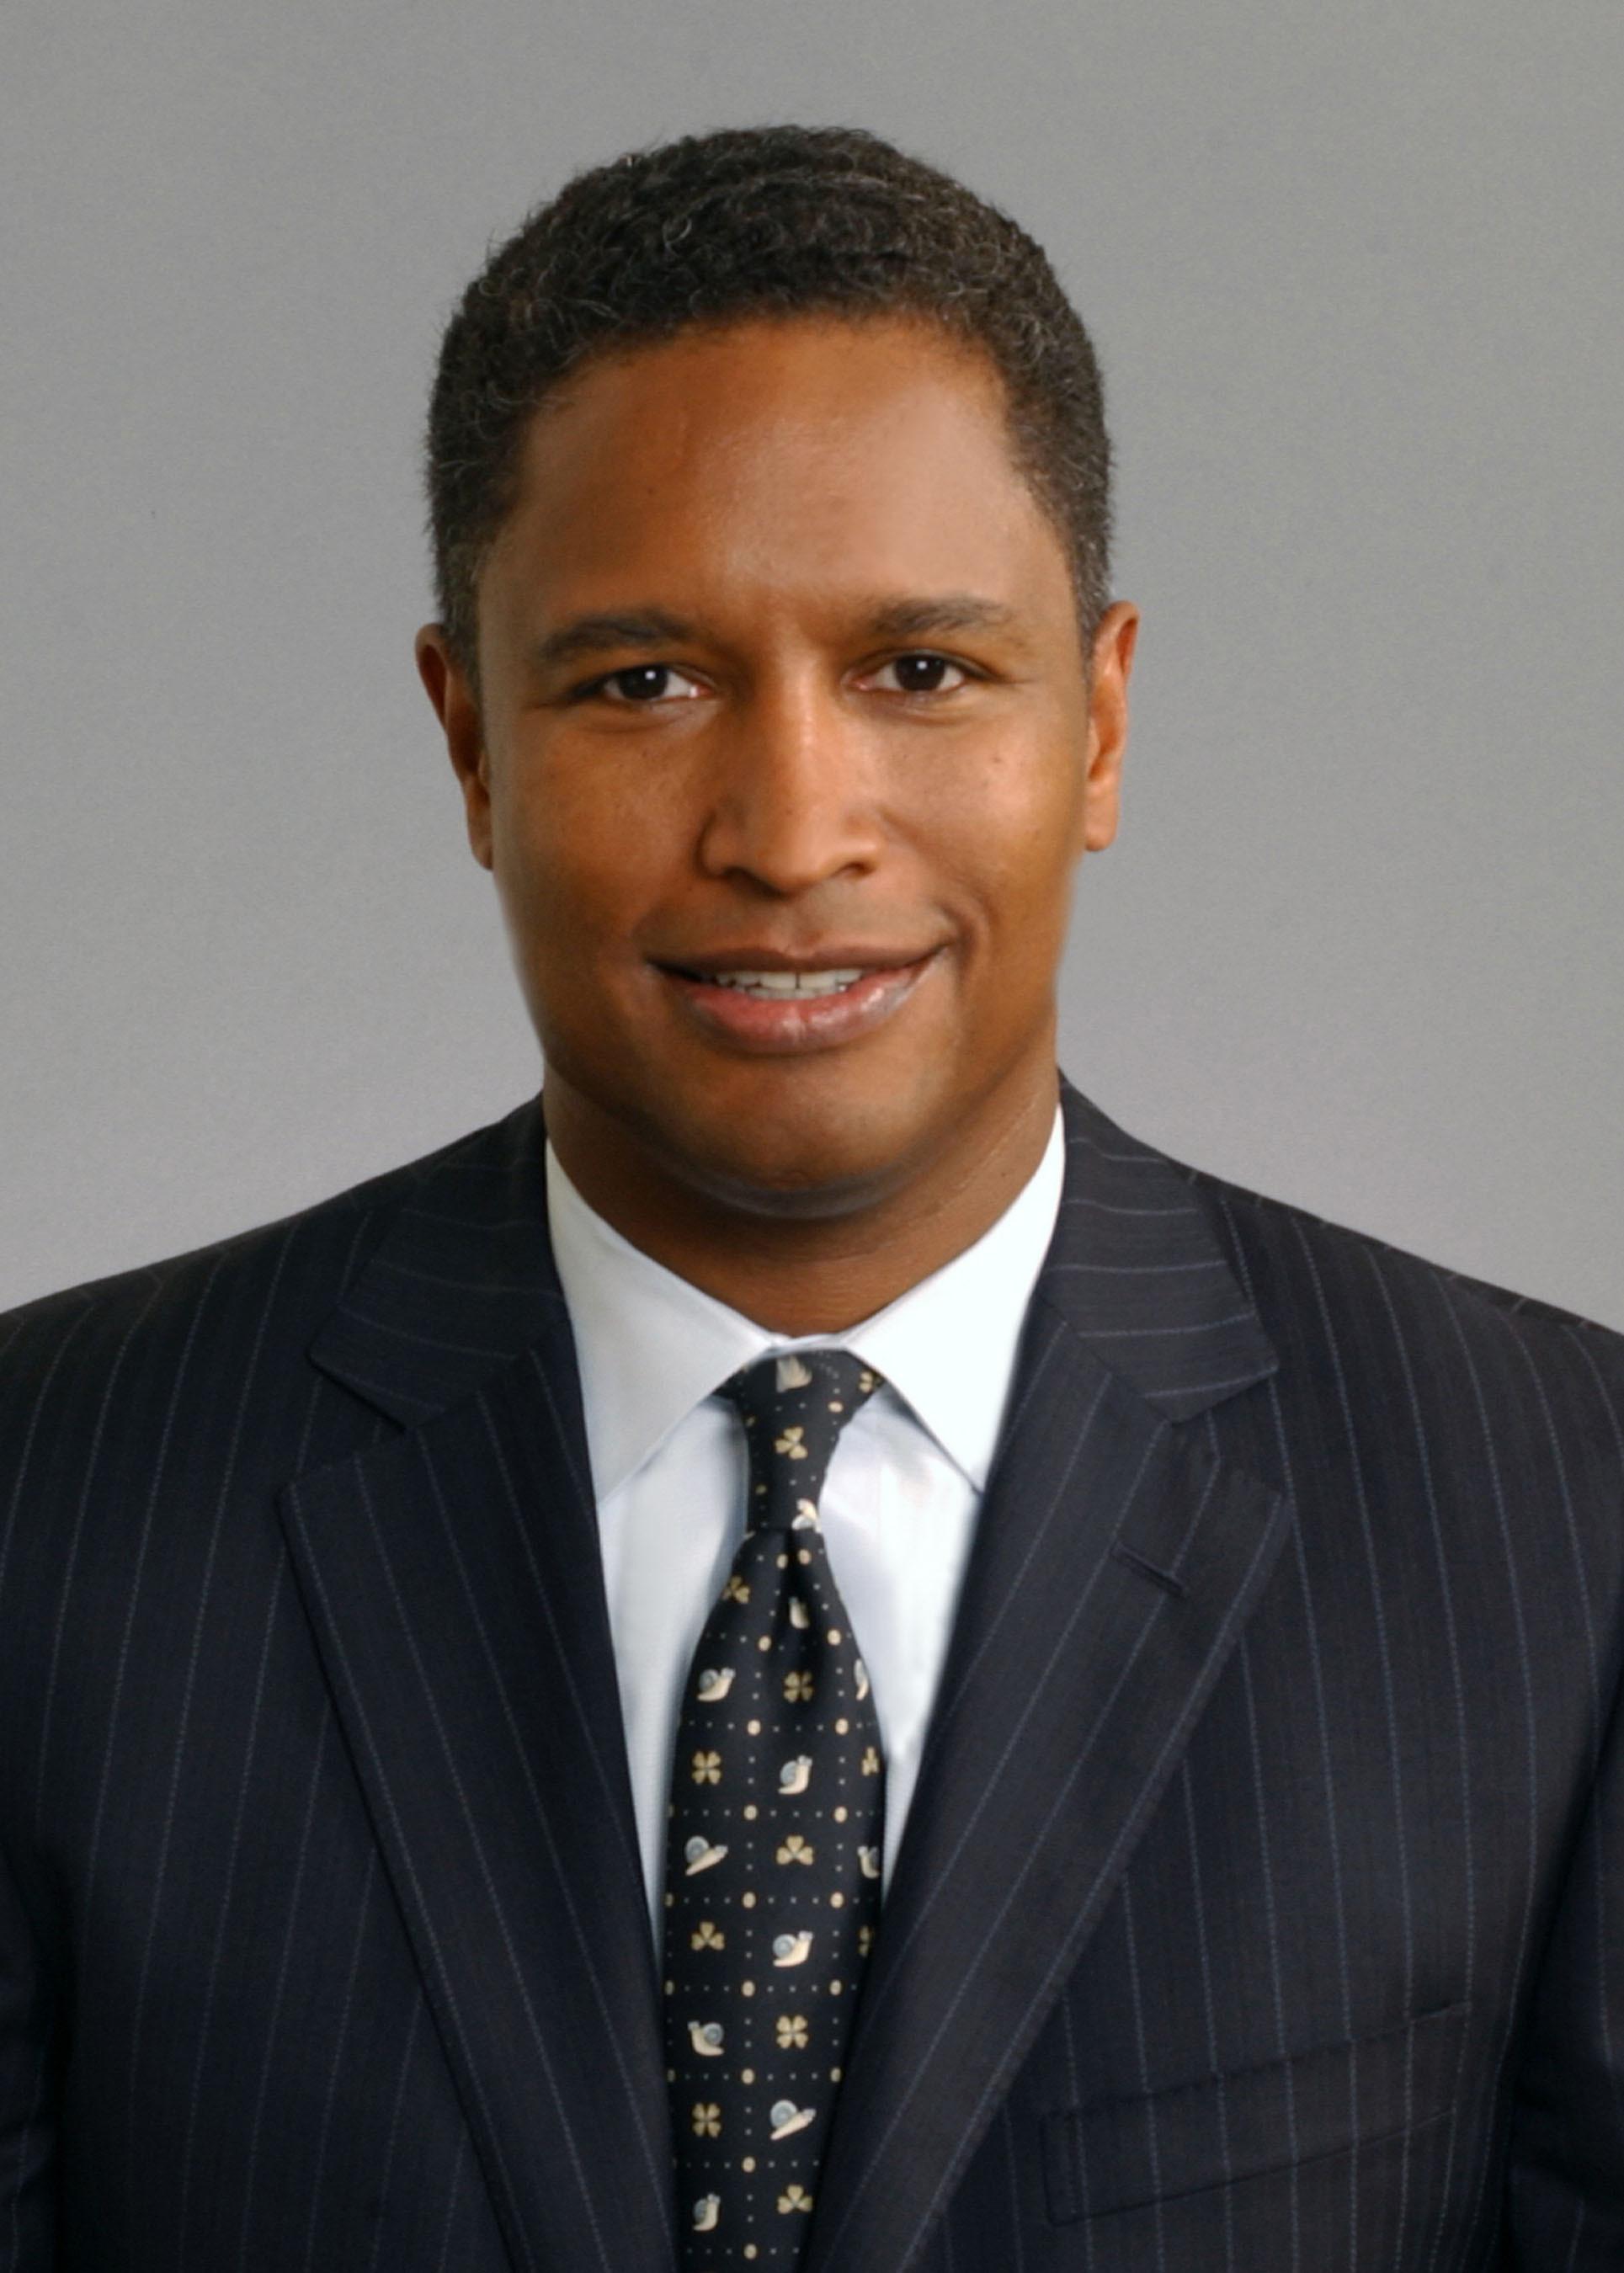 John D. Harris II. (PRNewsFoto/Raytheon Company) (PRNewsFoto/RAYTHEON COMPANY)